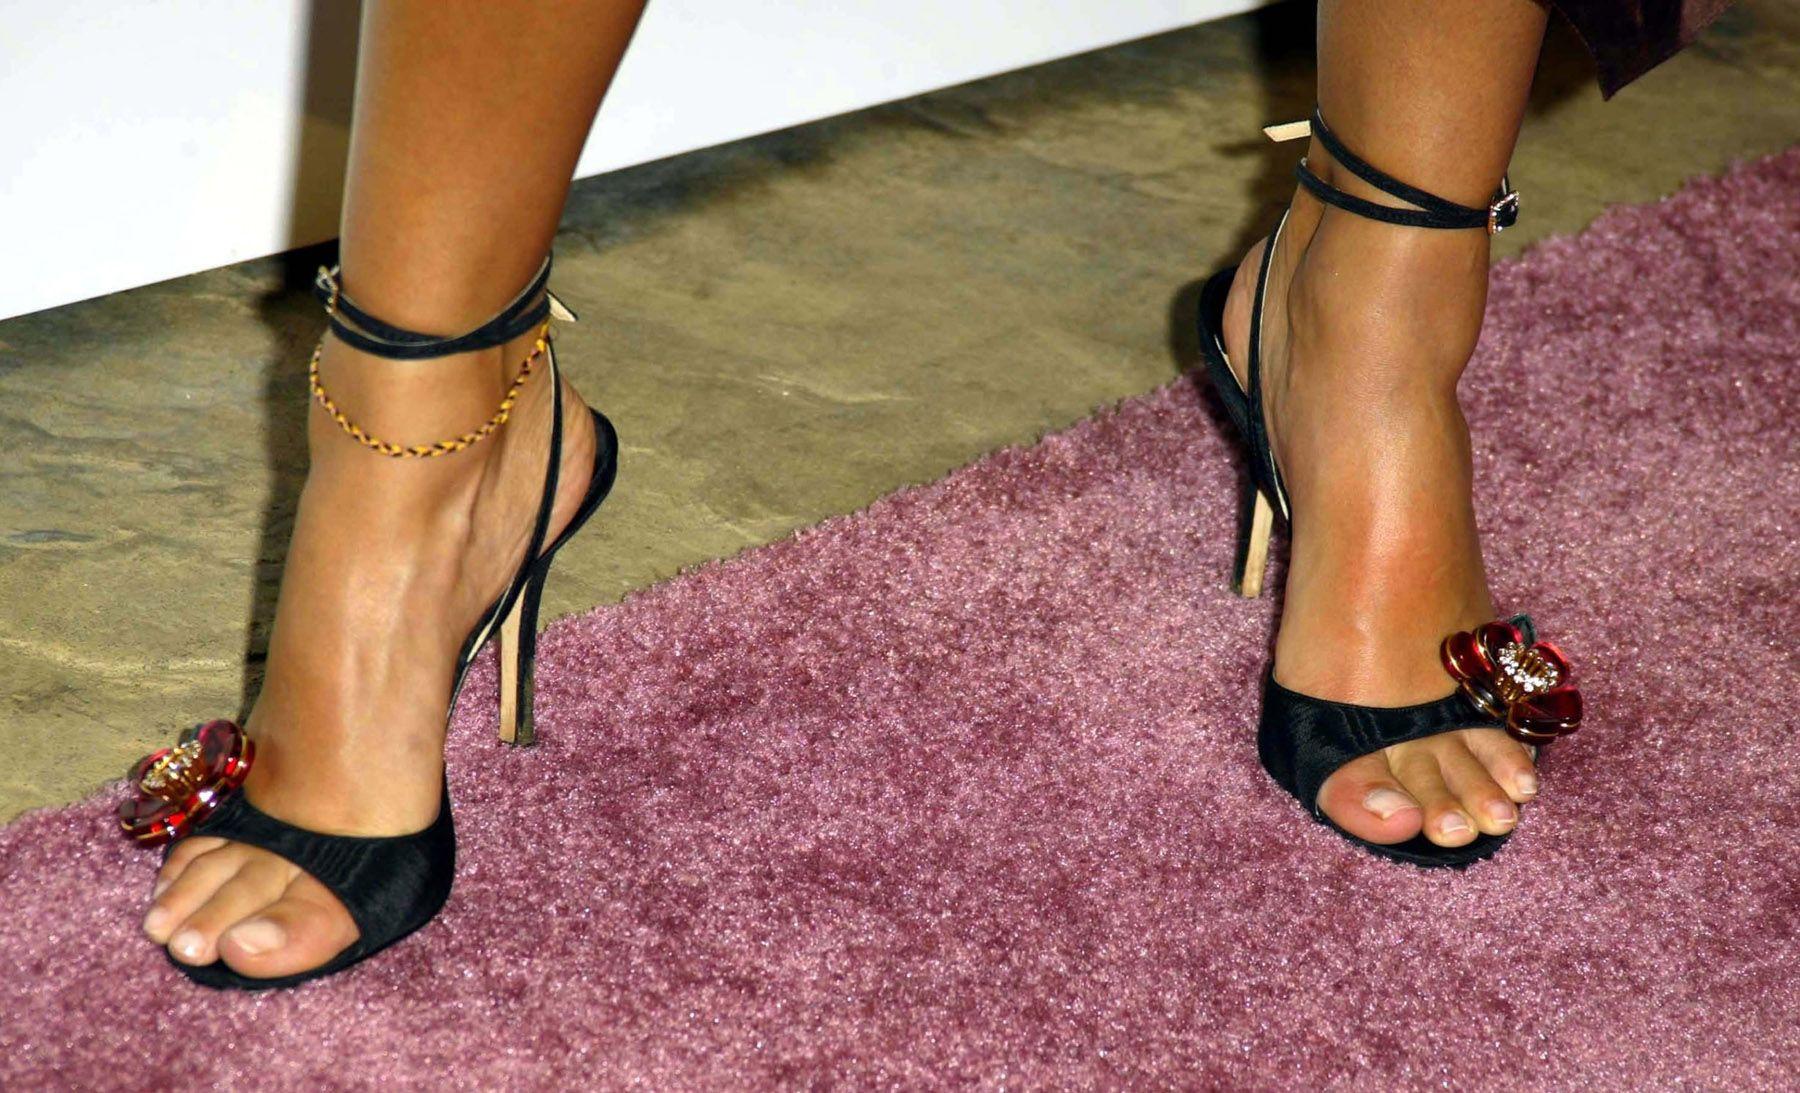 bfbc179364e Jessica Alba s Feet    wikiFeet